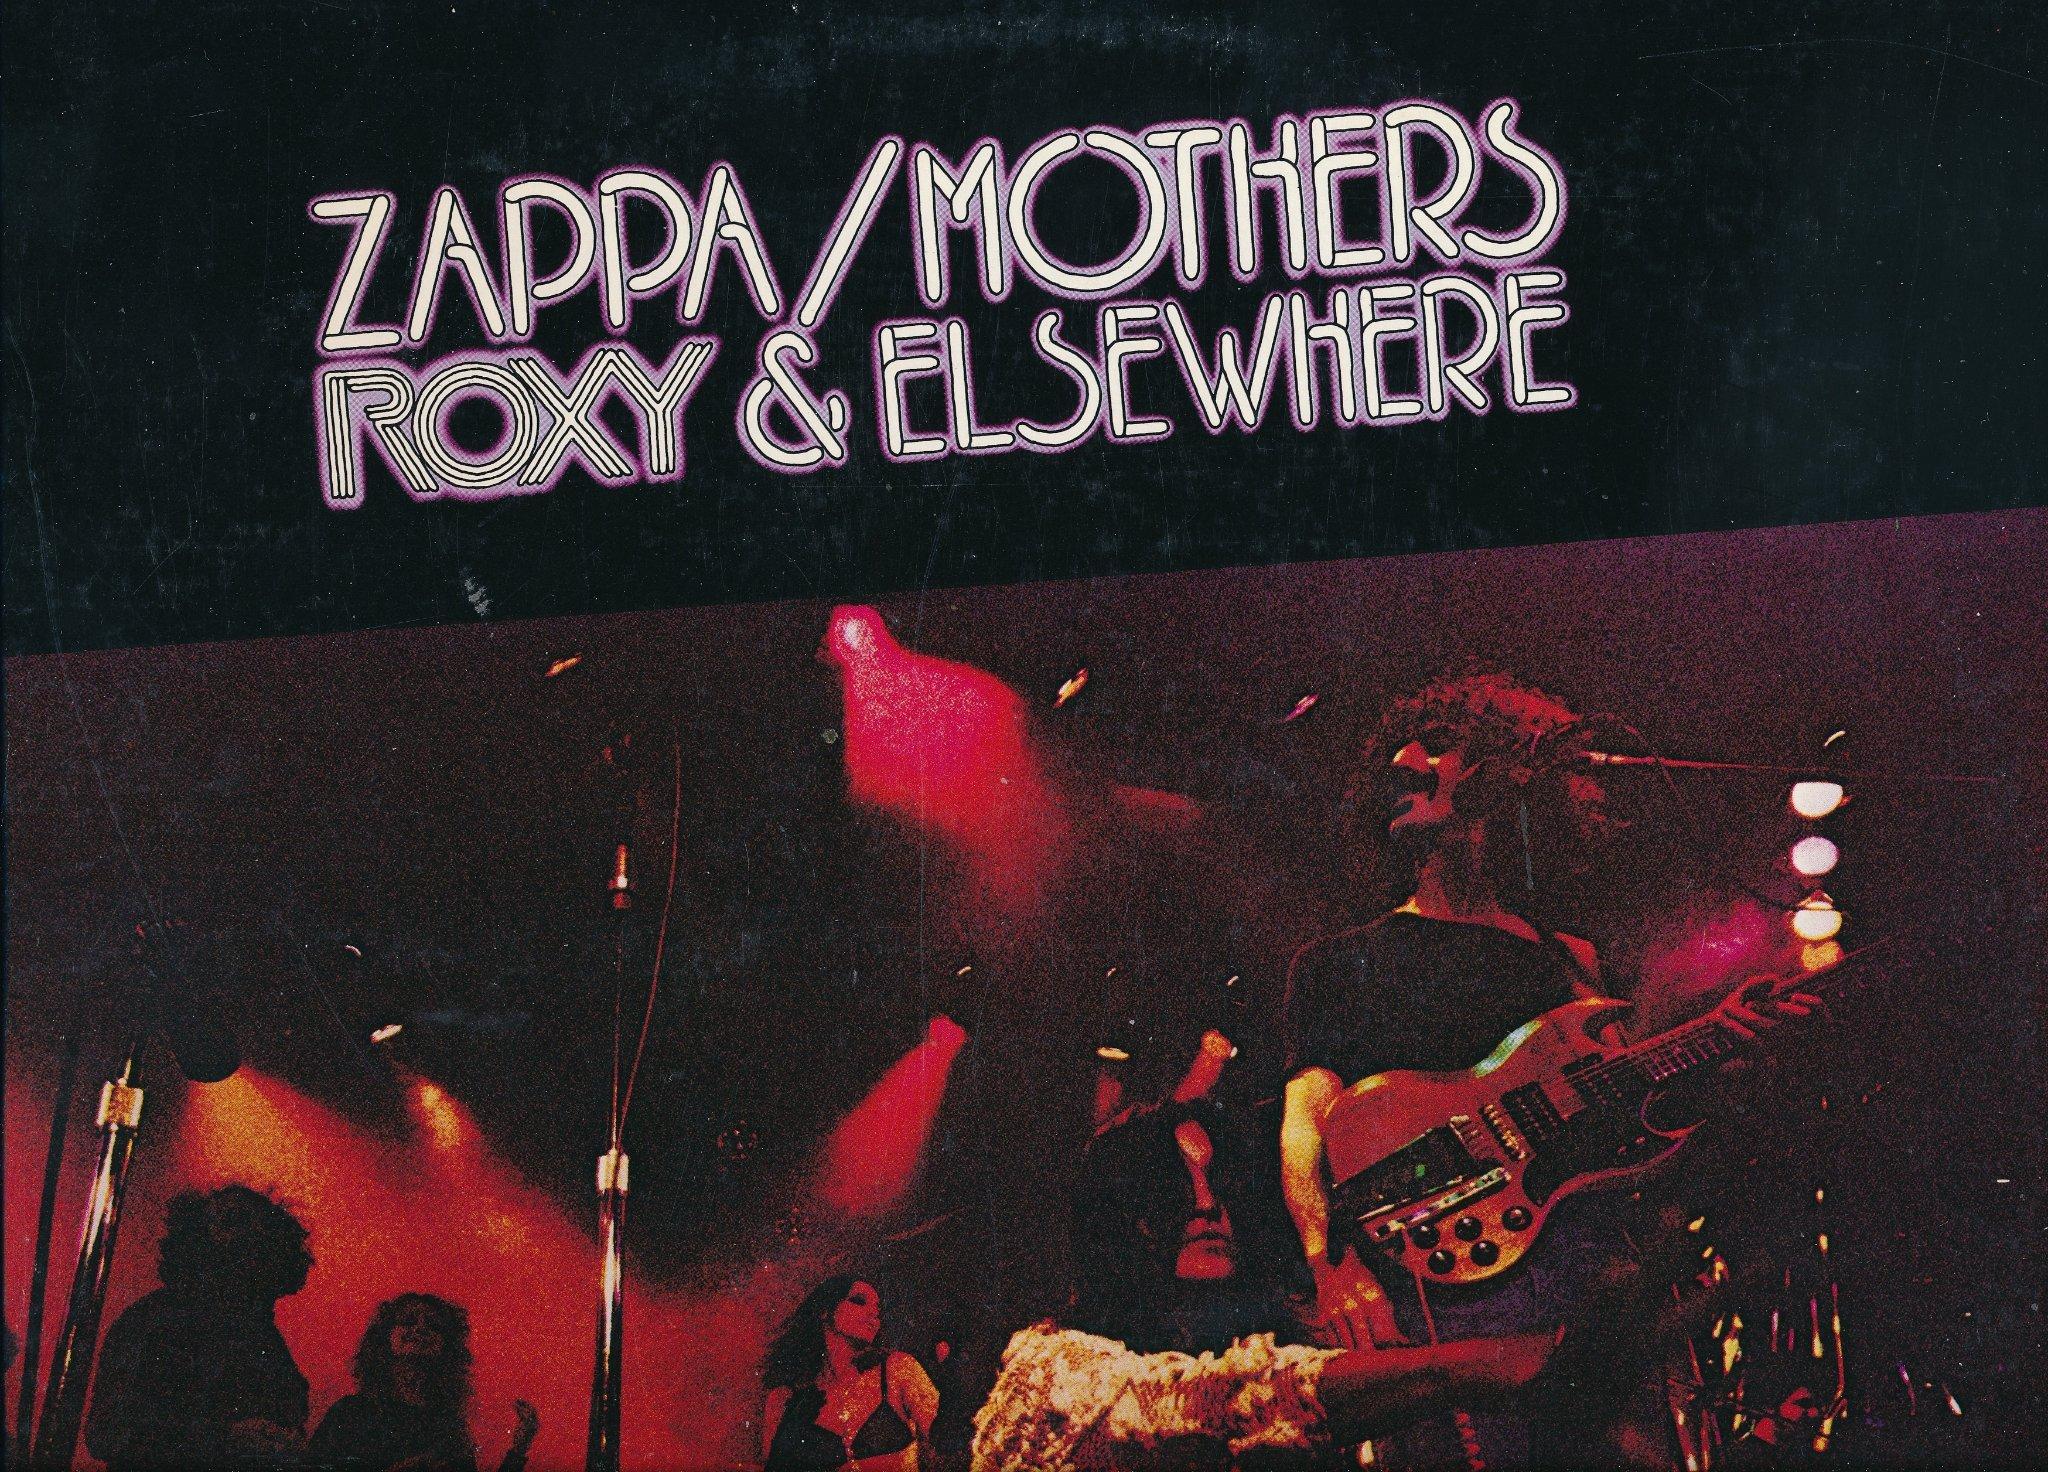 Zappa Mothers Roxy Amp Elsewhere 2 Lp 393715339 ᐈ K 246 P